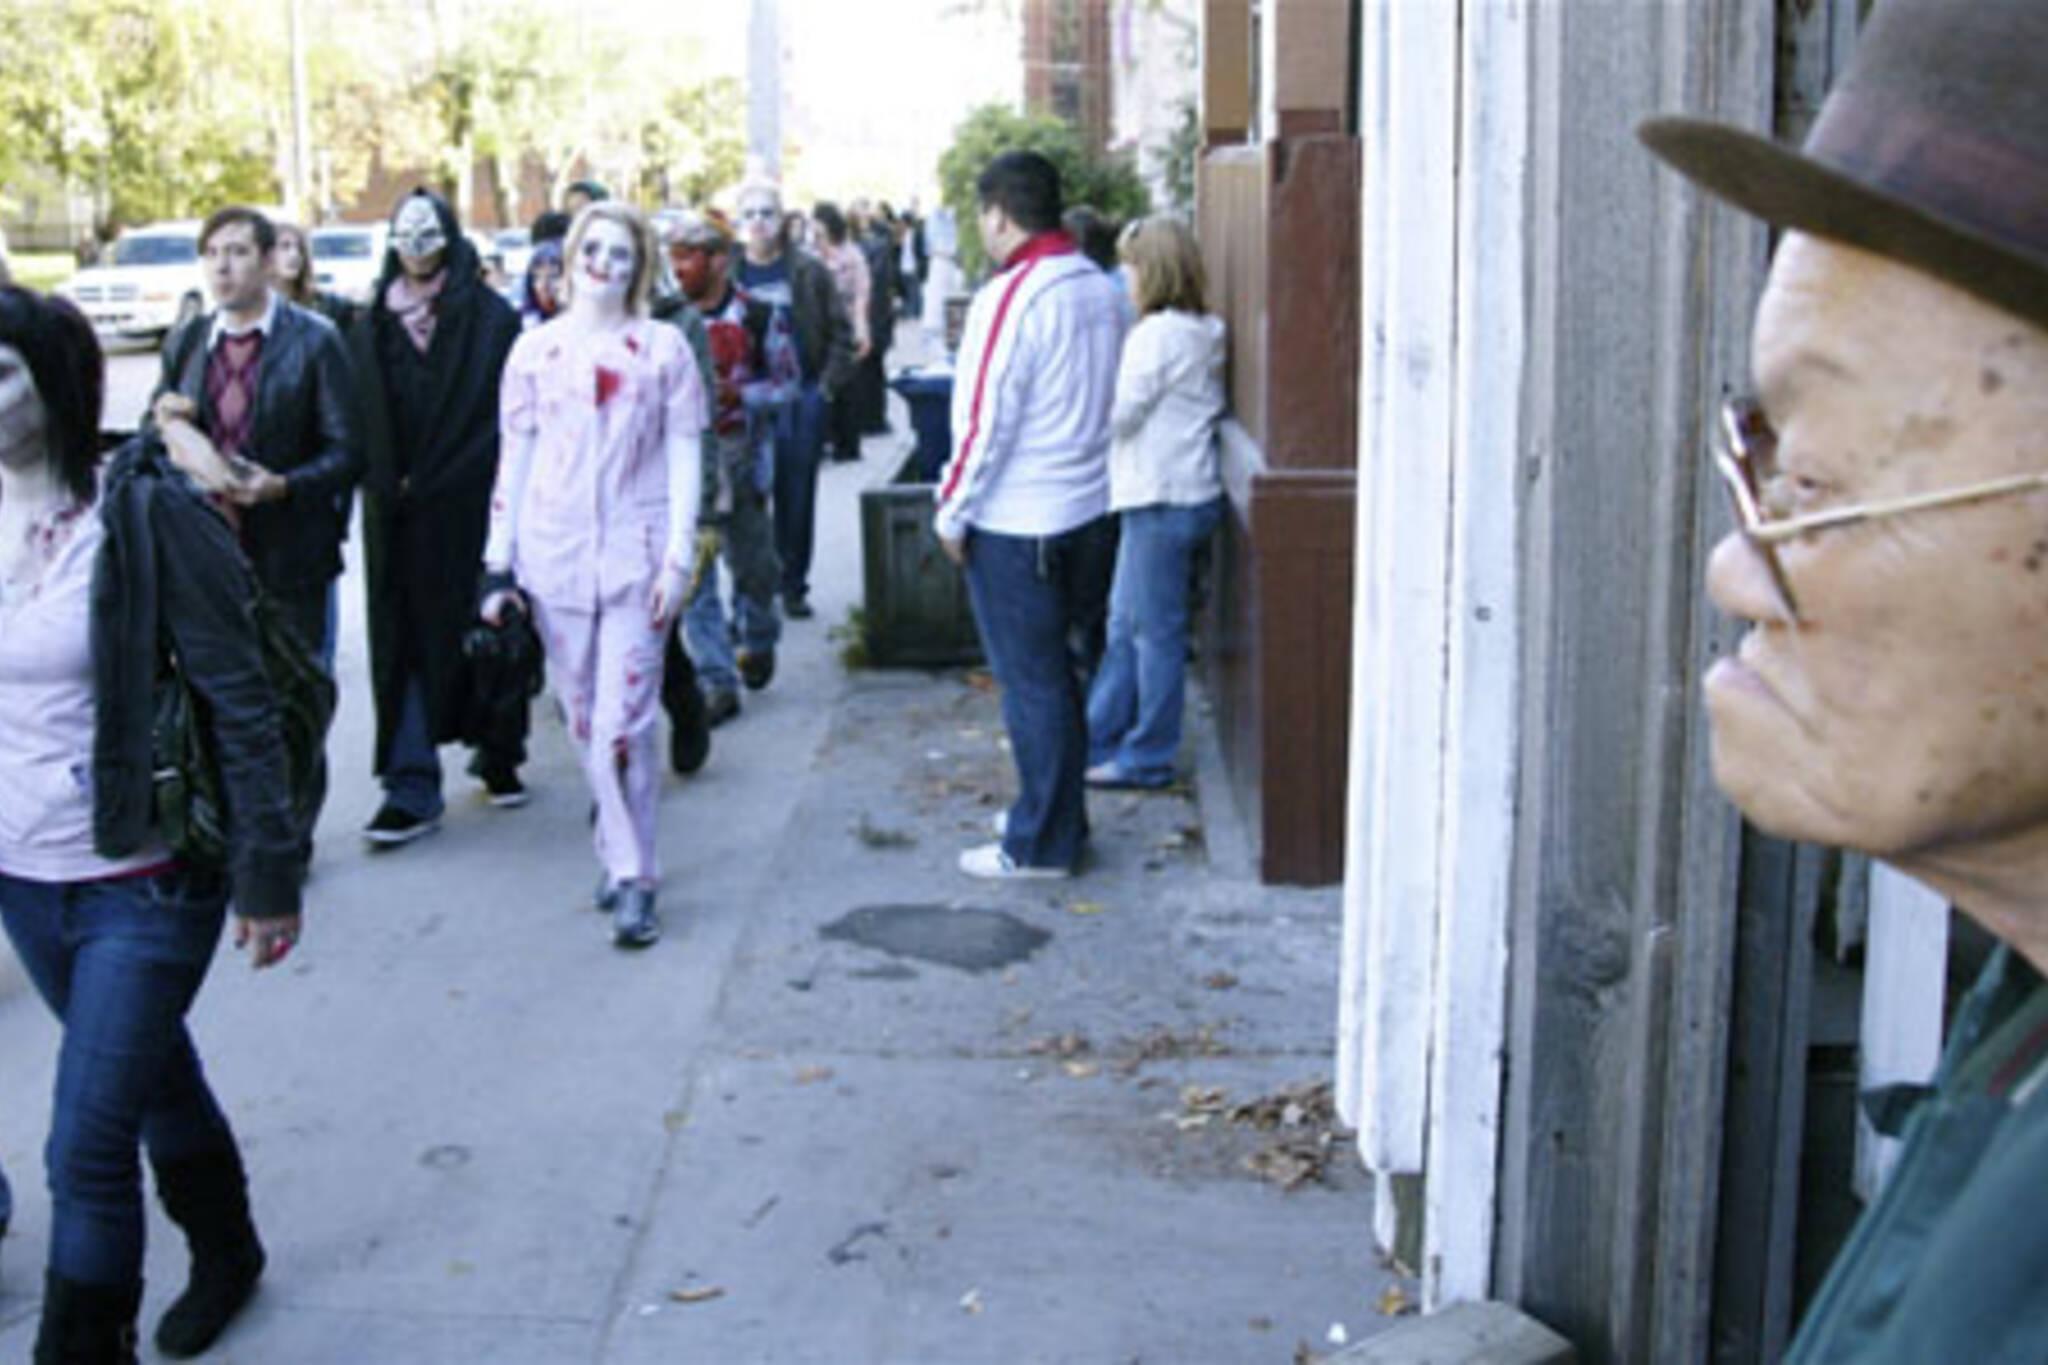 Toronto Zombie Walk 2008 in Toronto